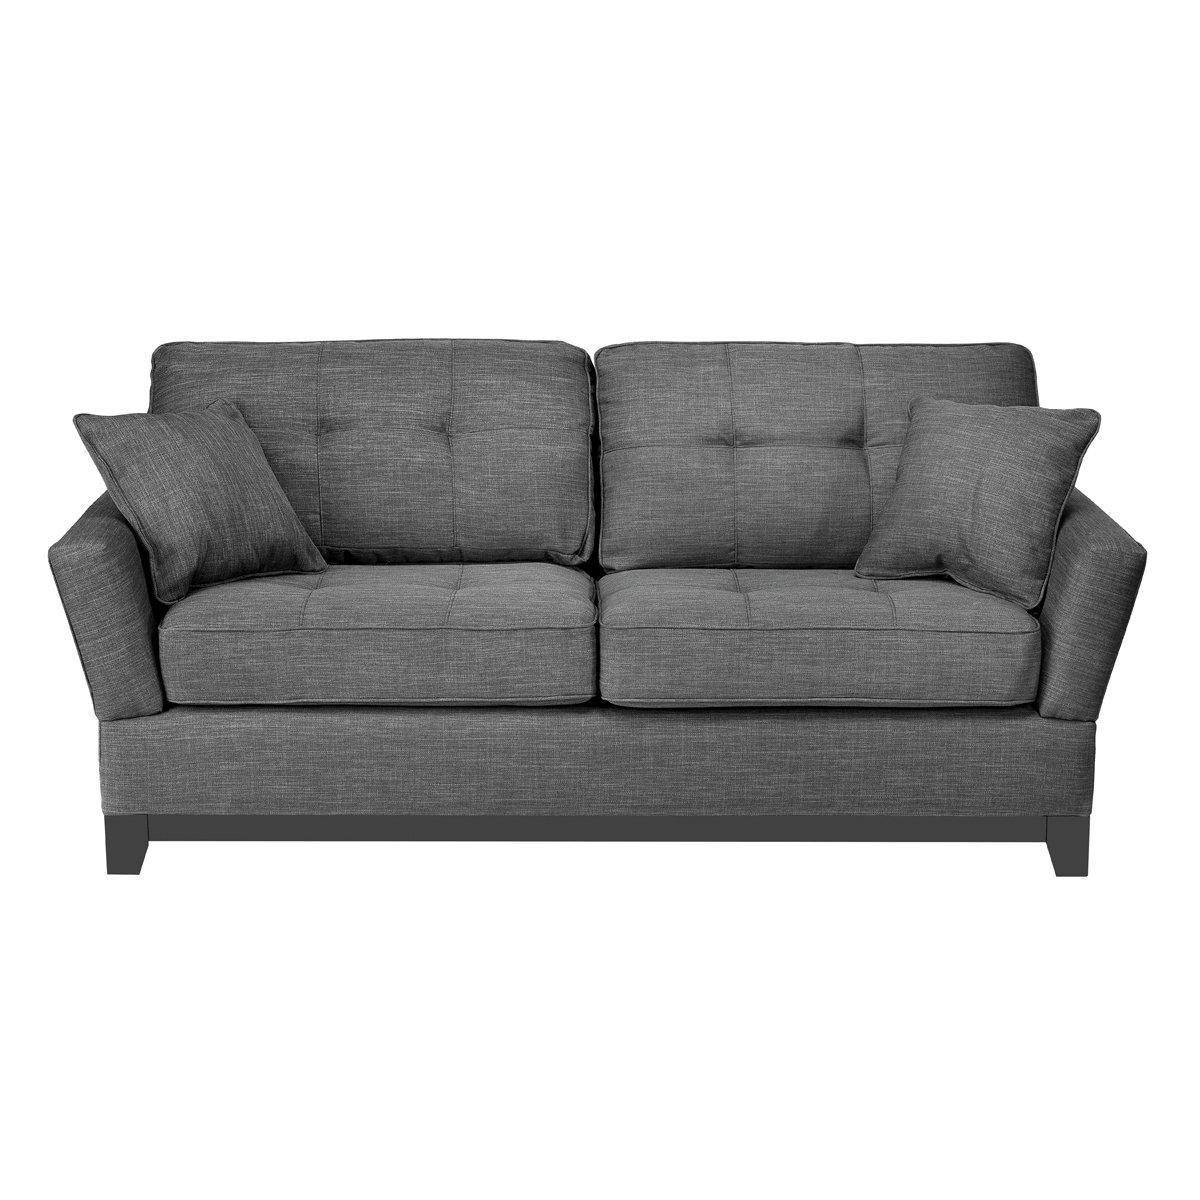 Opus Sofa With Sleeper Options Jennifer Furniture Sofa Love Seat